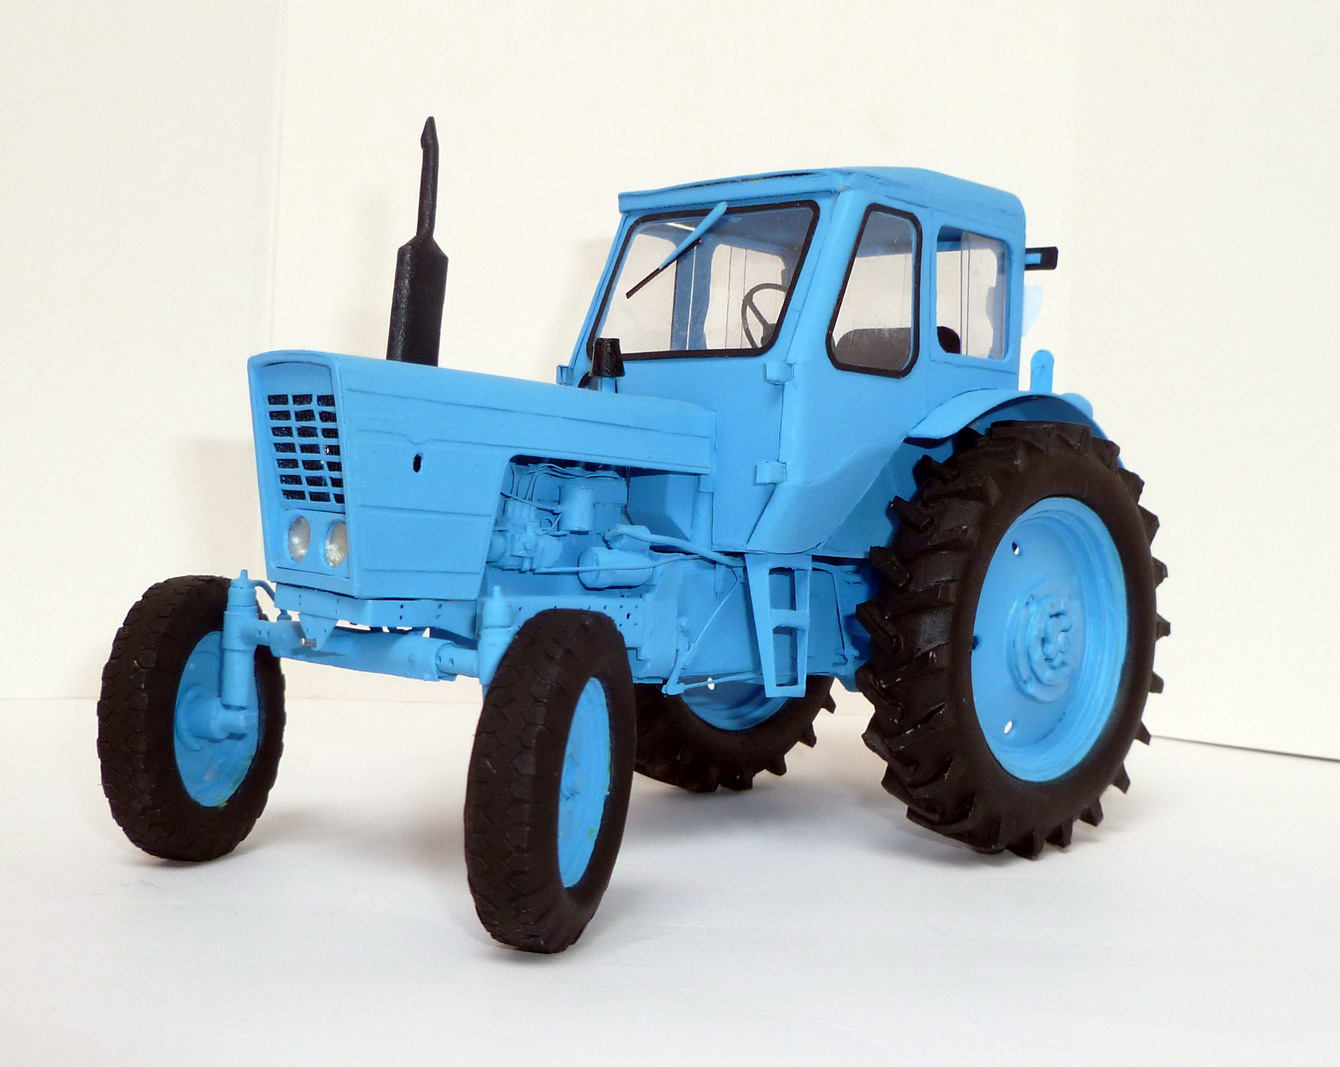 Трактор мтз бу в башкортостане | Трактора БУ Купить Б/У.